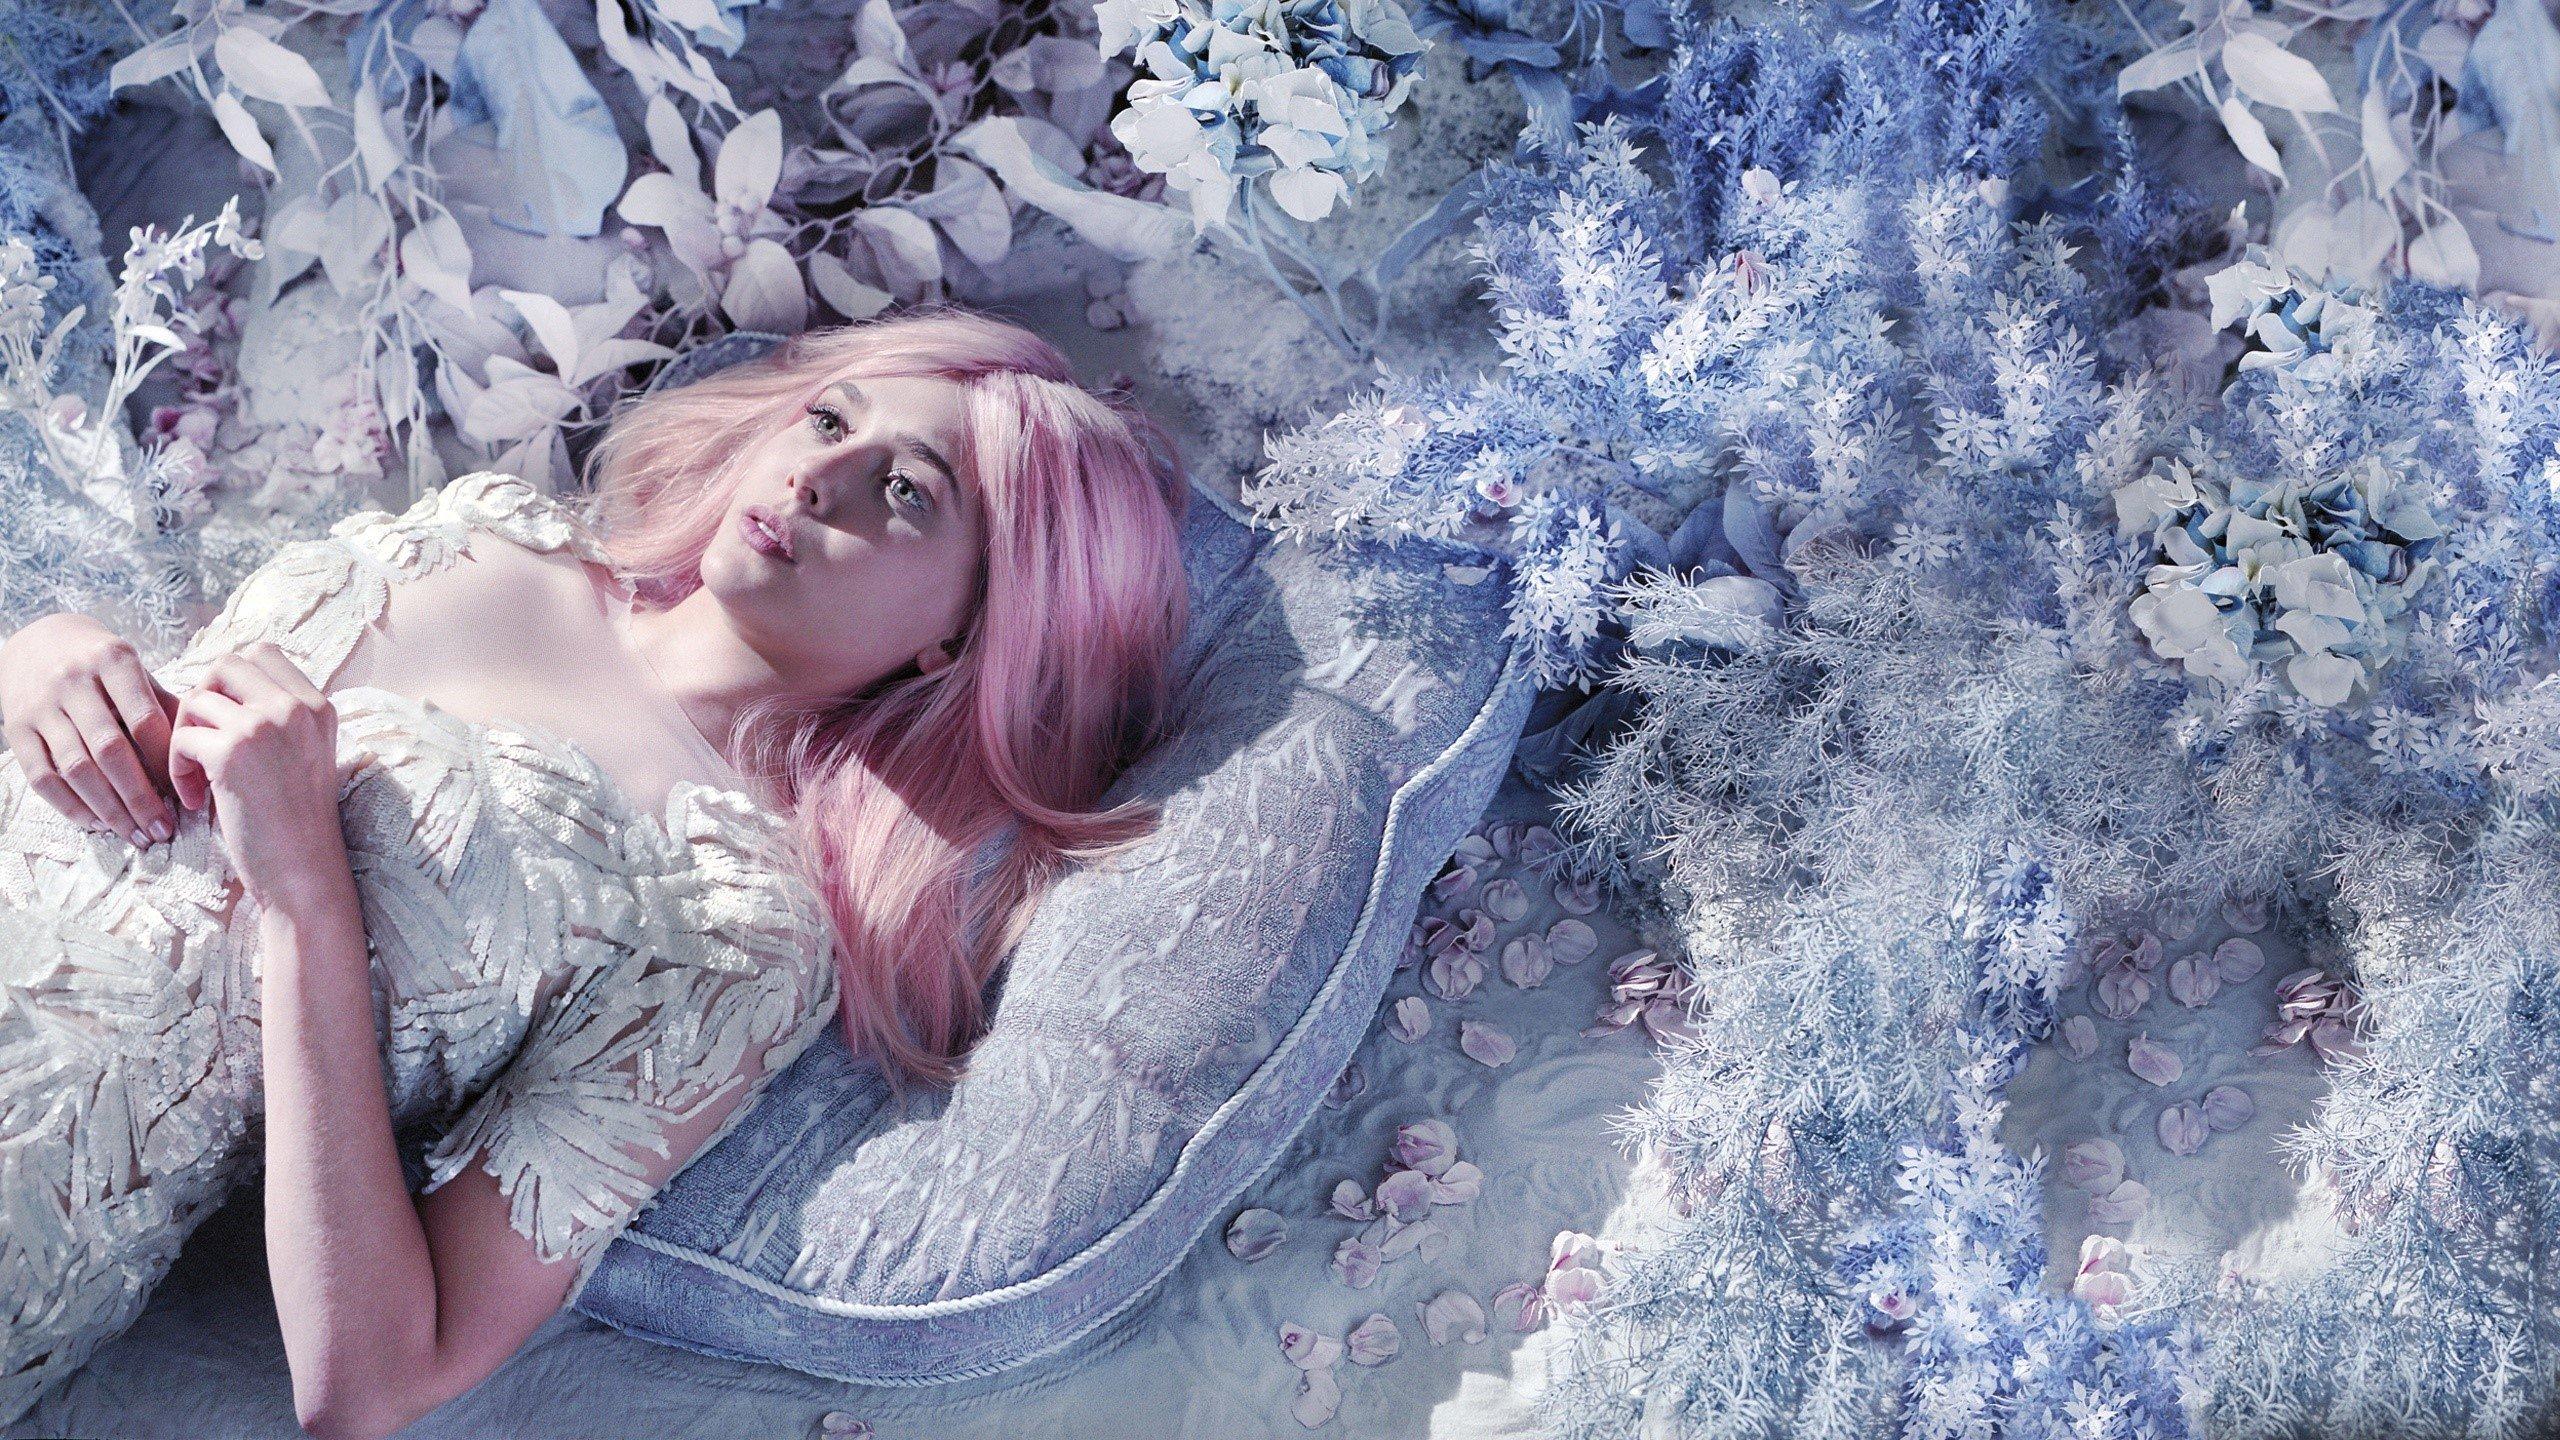 Fondos de pantalla Elizabeth Olsen con cabello rosa